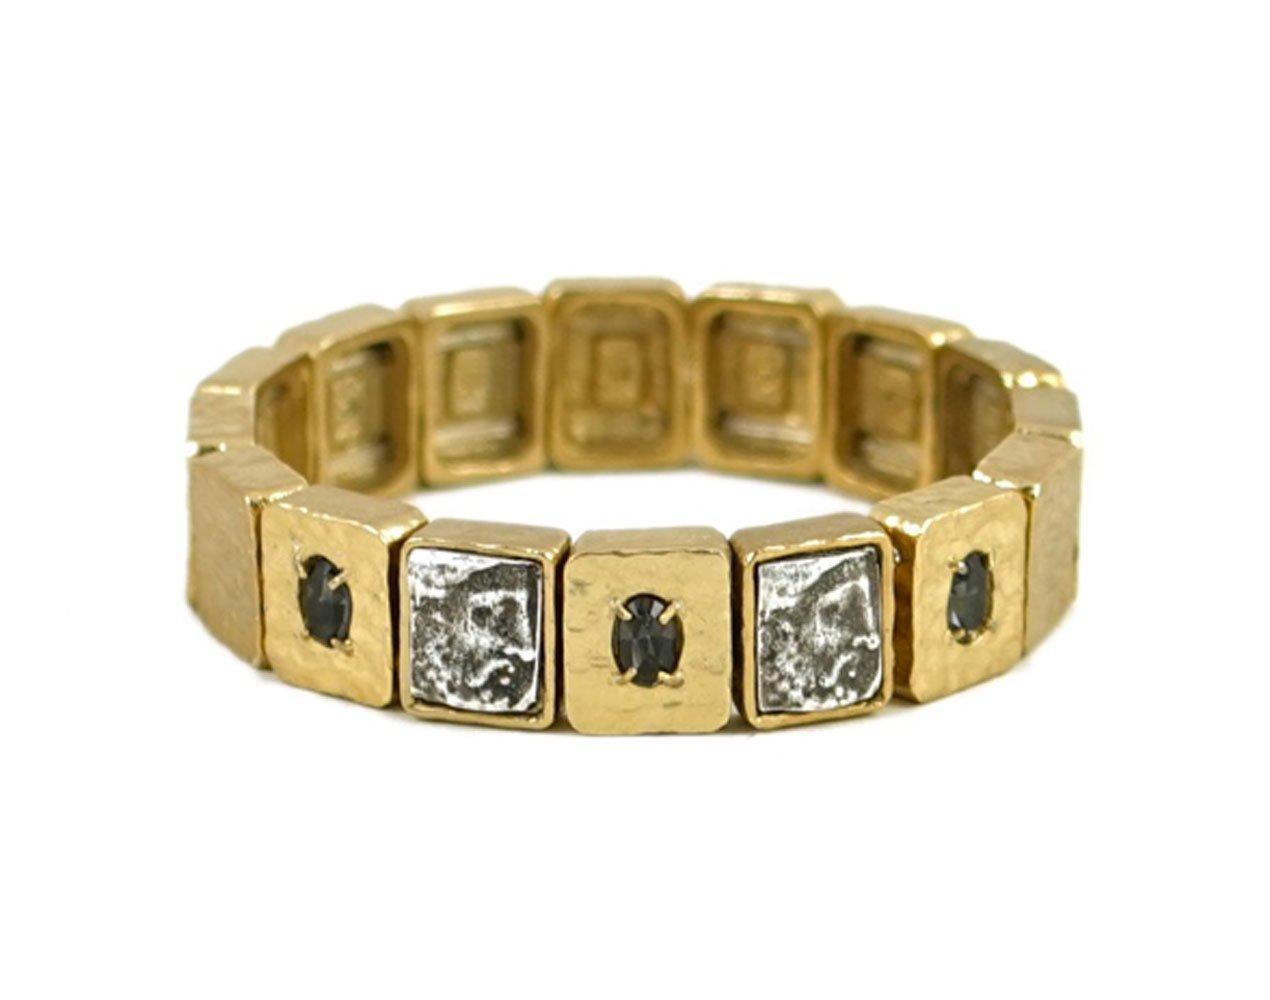 Tat2 Designs Women's Gold Plated & Black Diamond Cloch Roman Man Bracelet